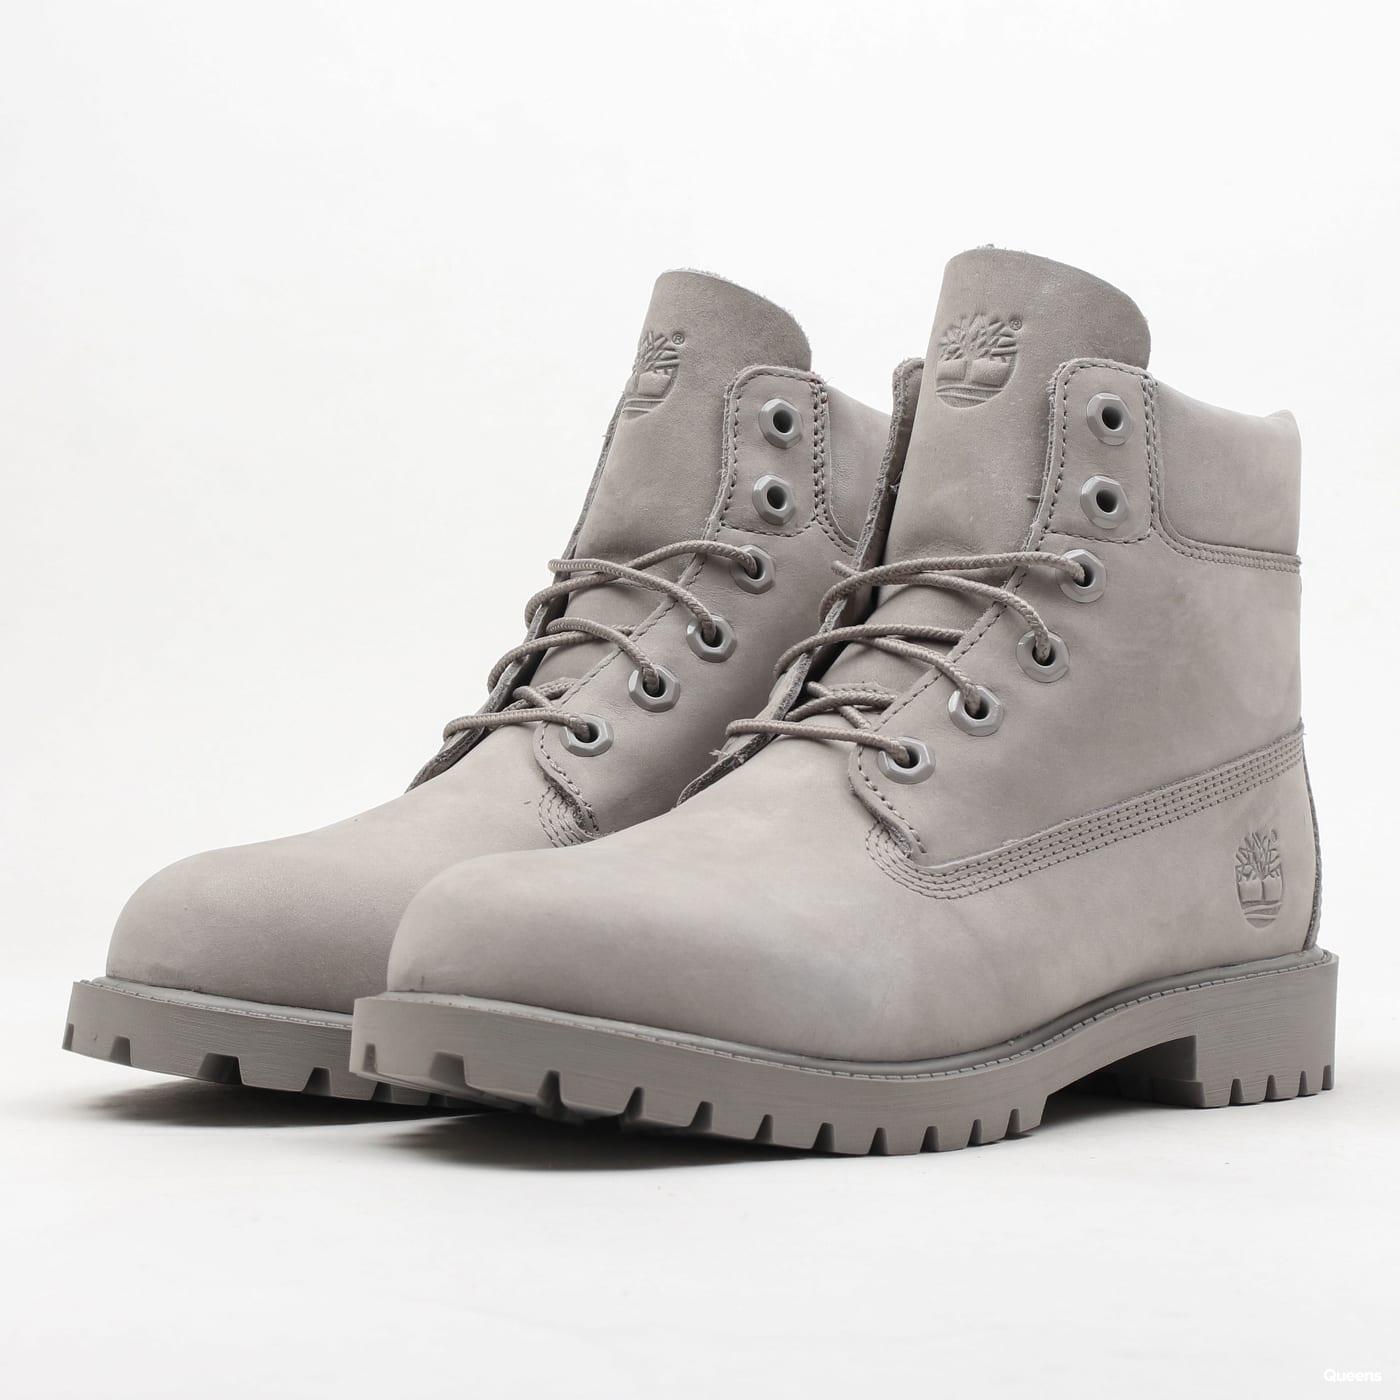 a90f7531e76 Dámské zimní boty Timberland 6 Inch Premium WP Boot (A172F - GRY) – Queens  💚